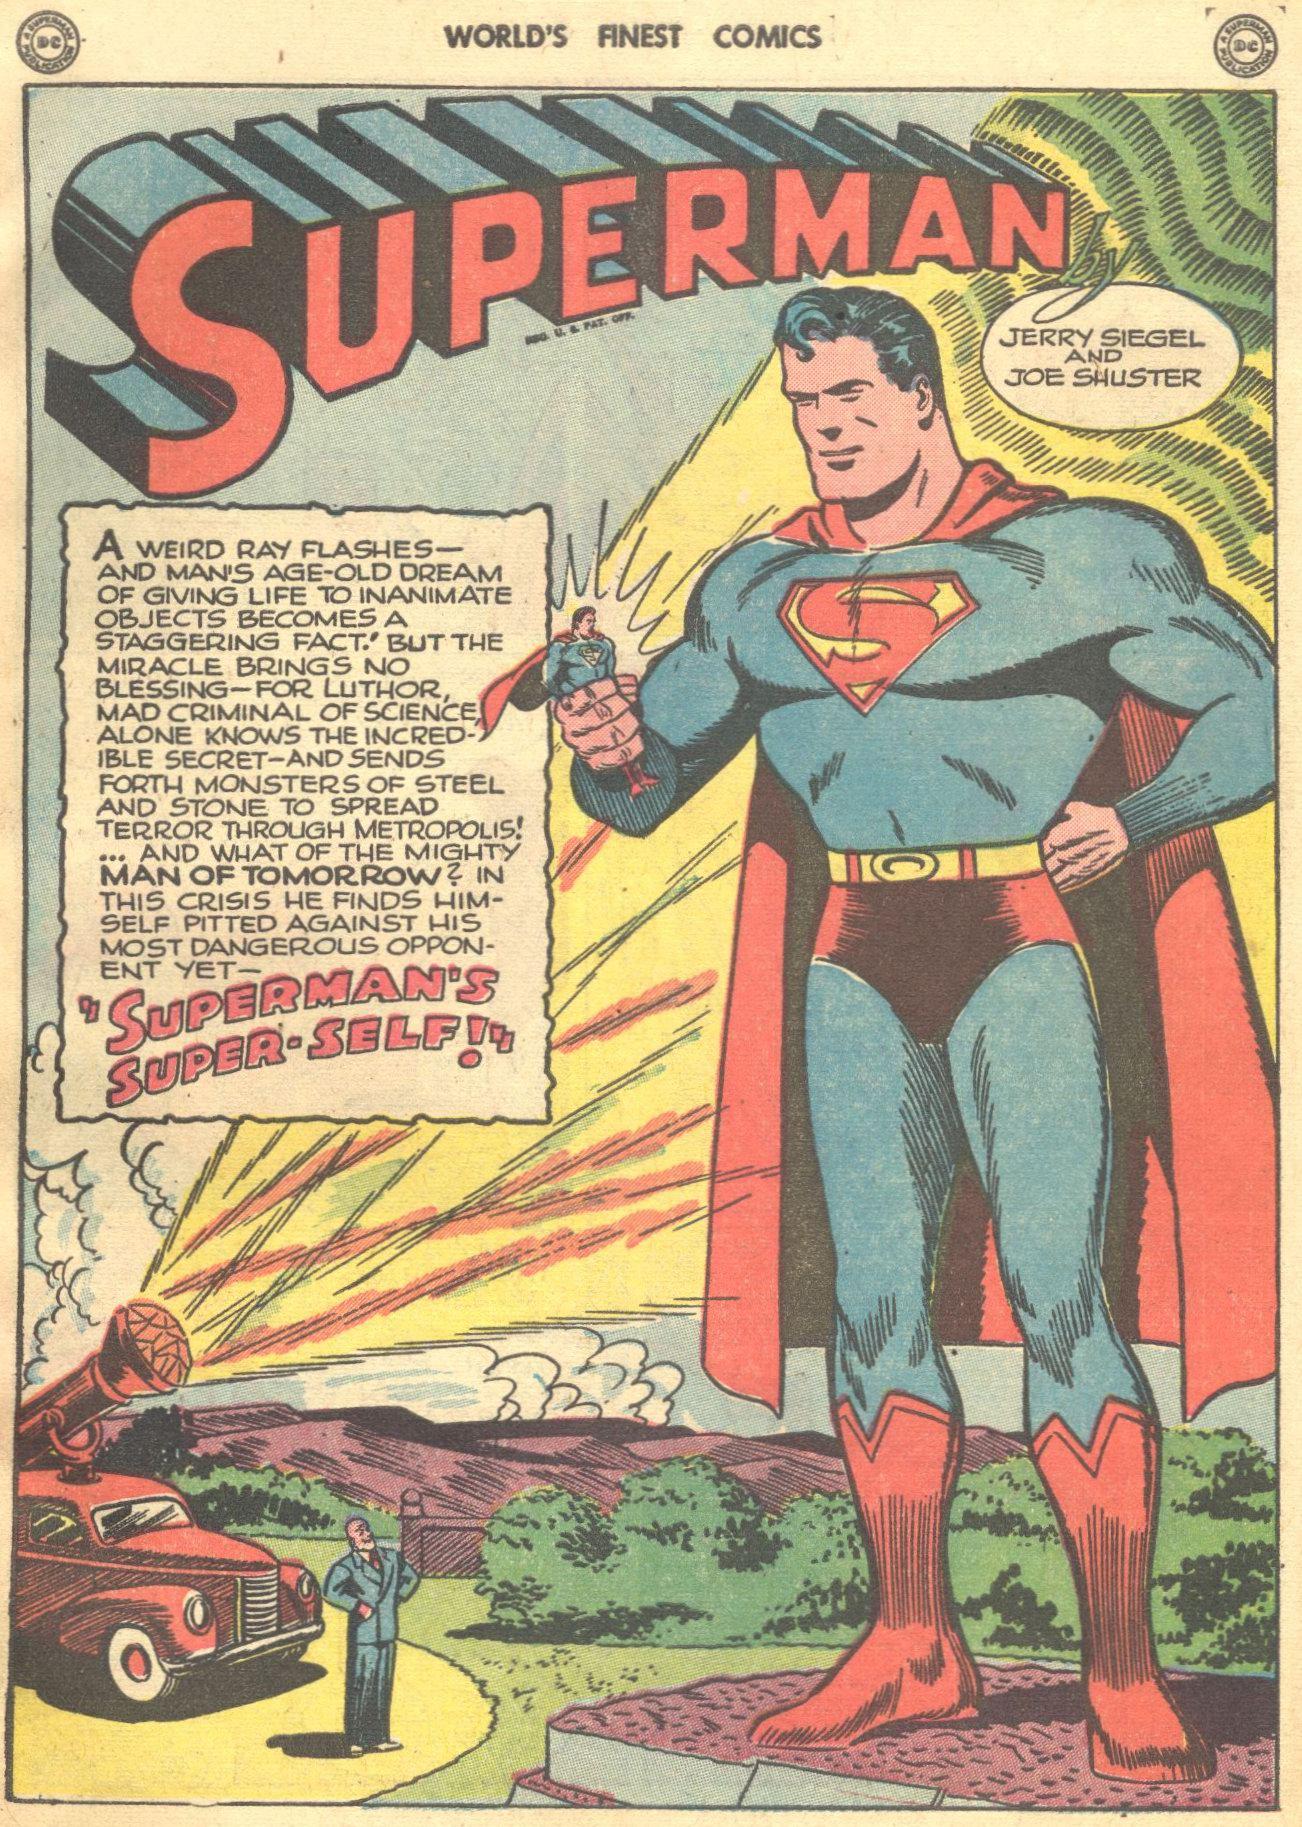 Read online World's Finest Comics comic -  Issue #28 - 2